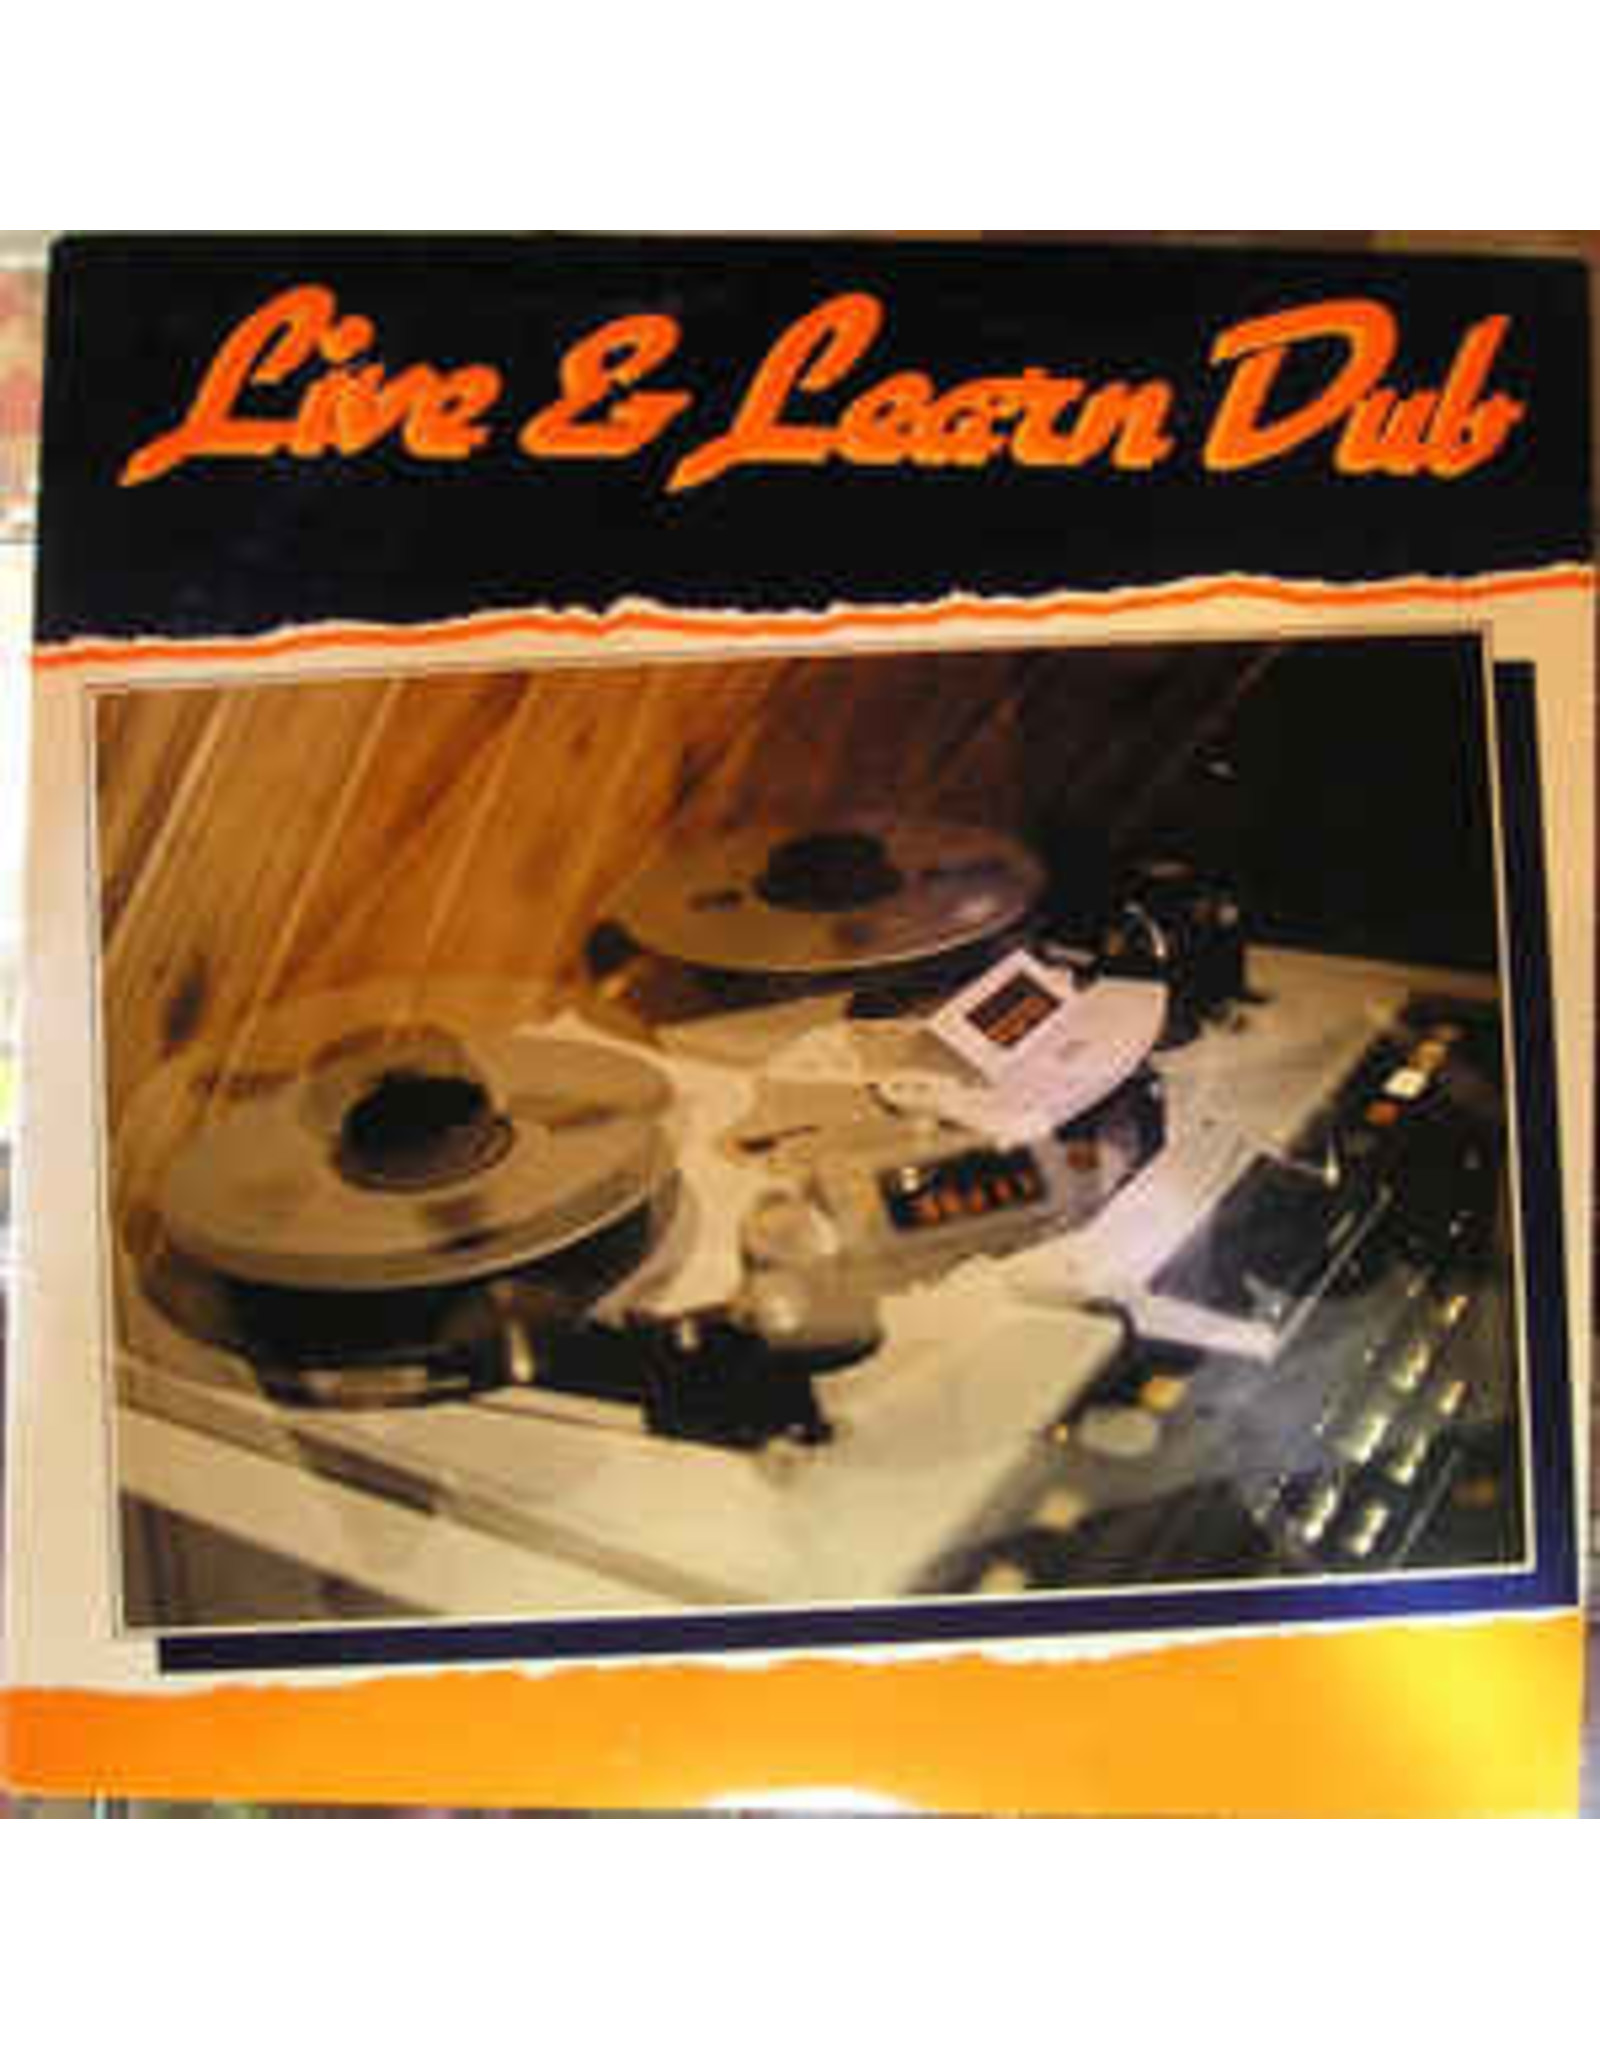 New Vinyl Delroy Wright - Live & Learn Dub LP